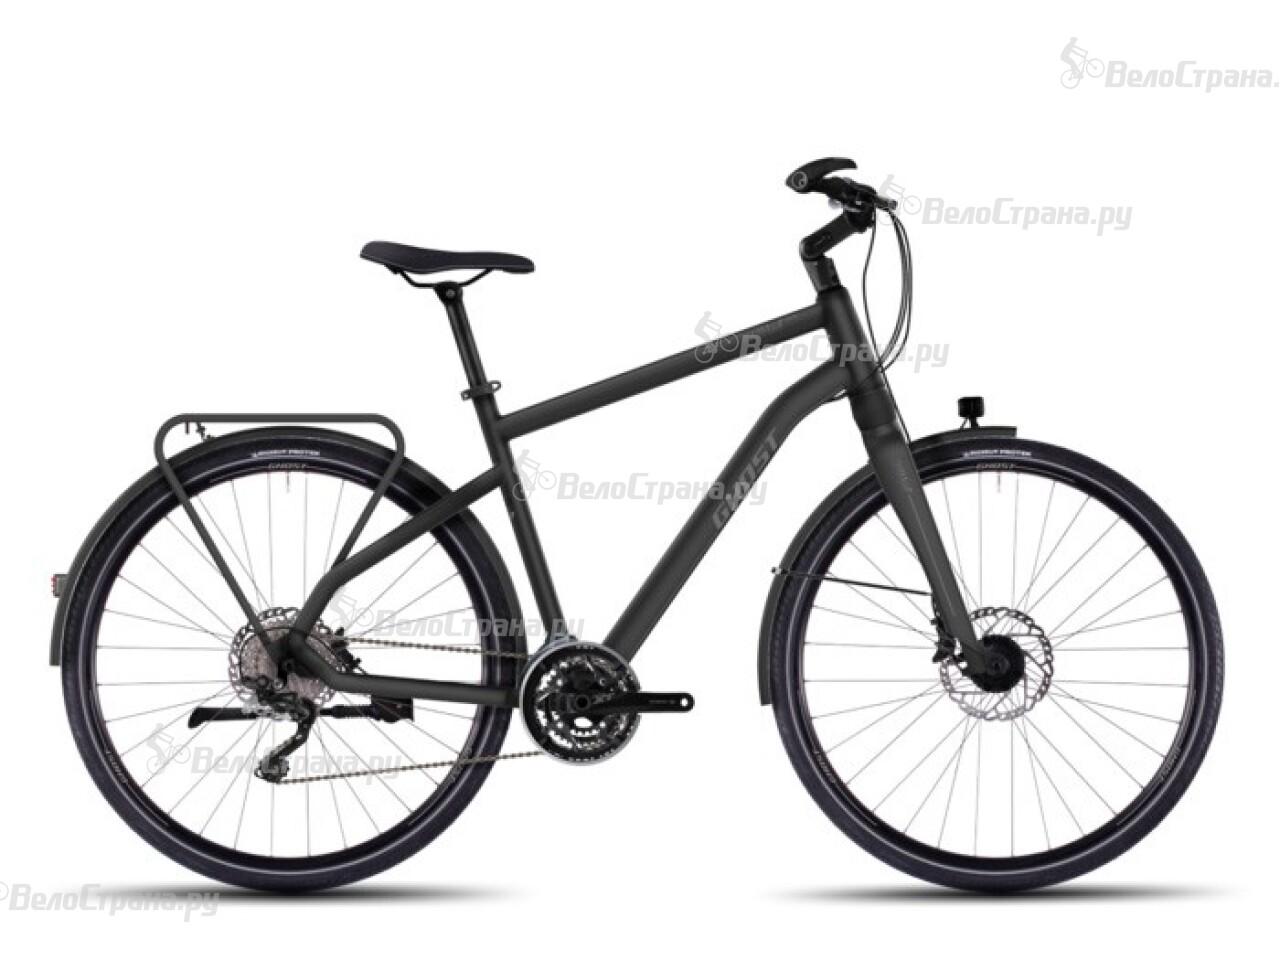 Велосипед Ghost SQUARE Trekking 8 (2016) цены онлайн